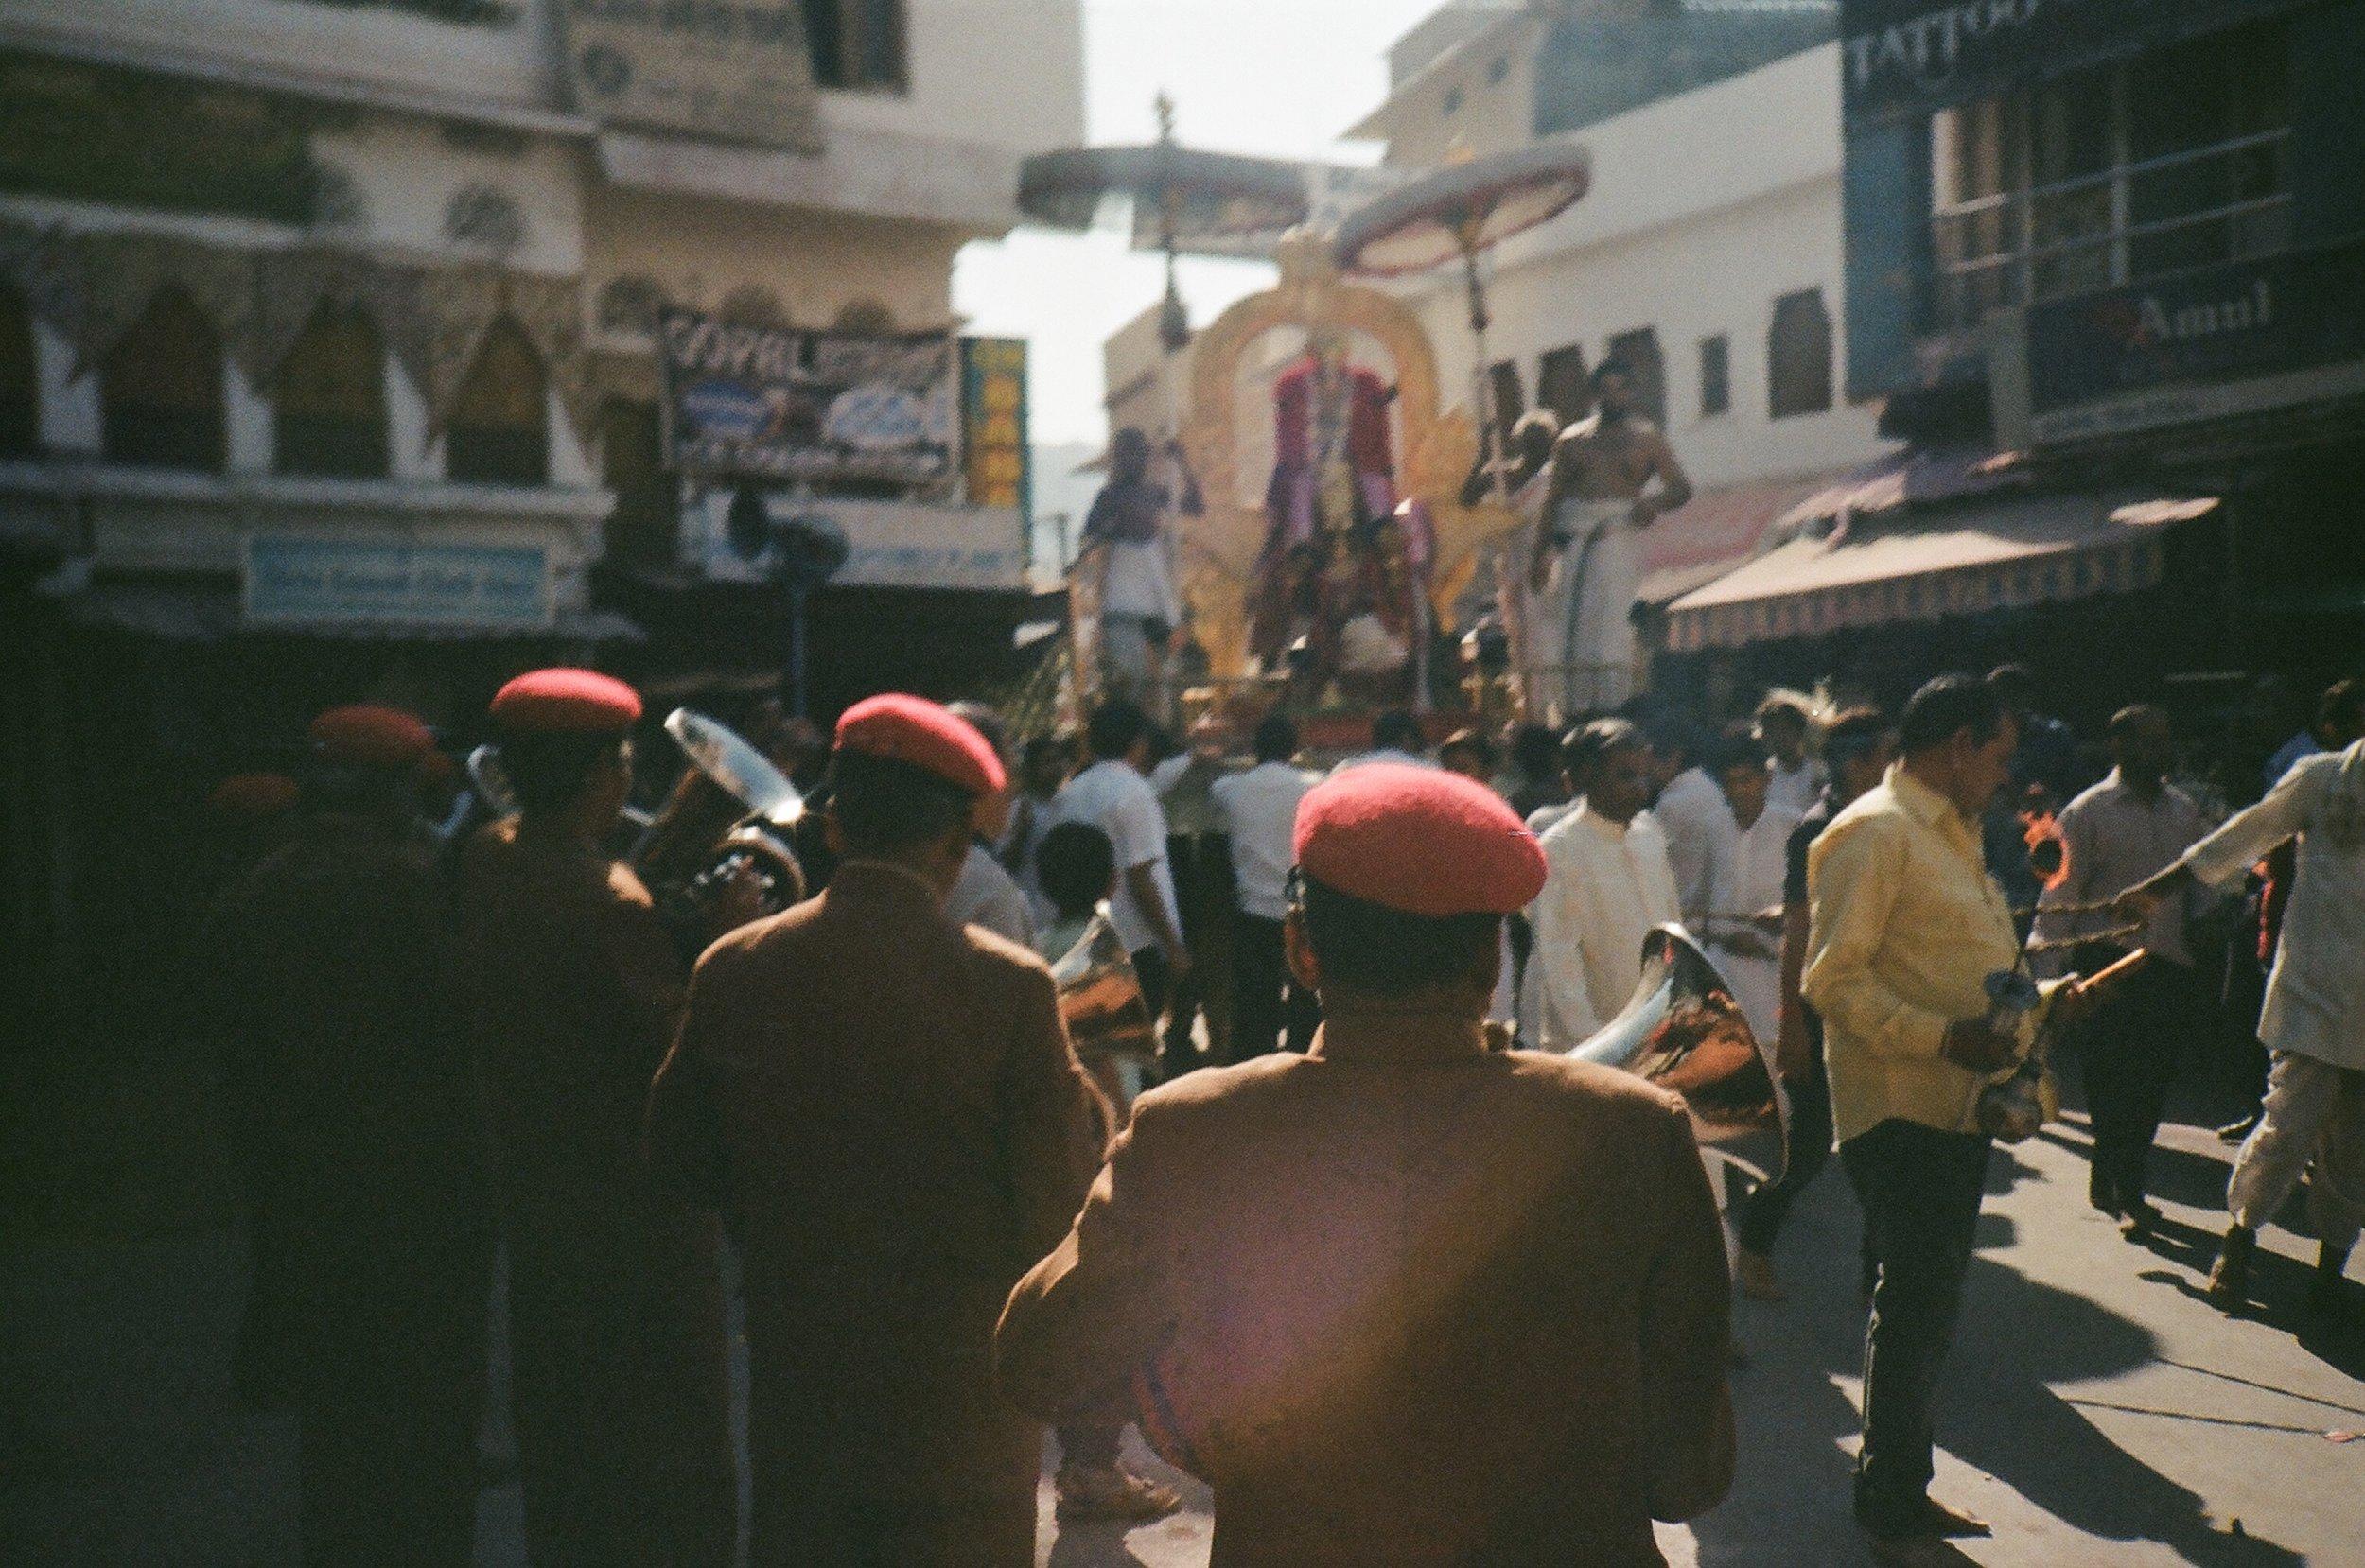 Pushkar_India_Eagertourist.jpg